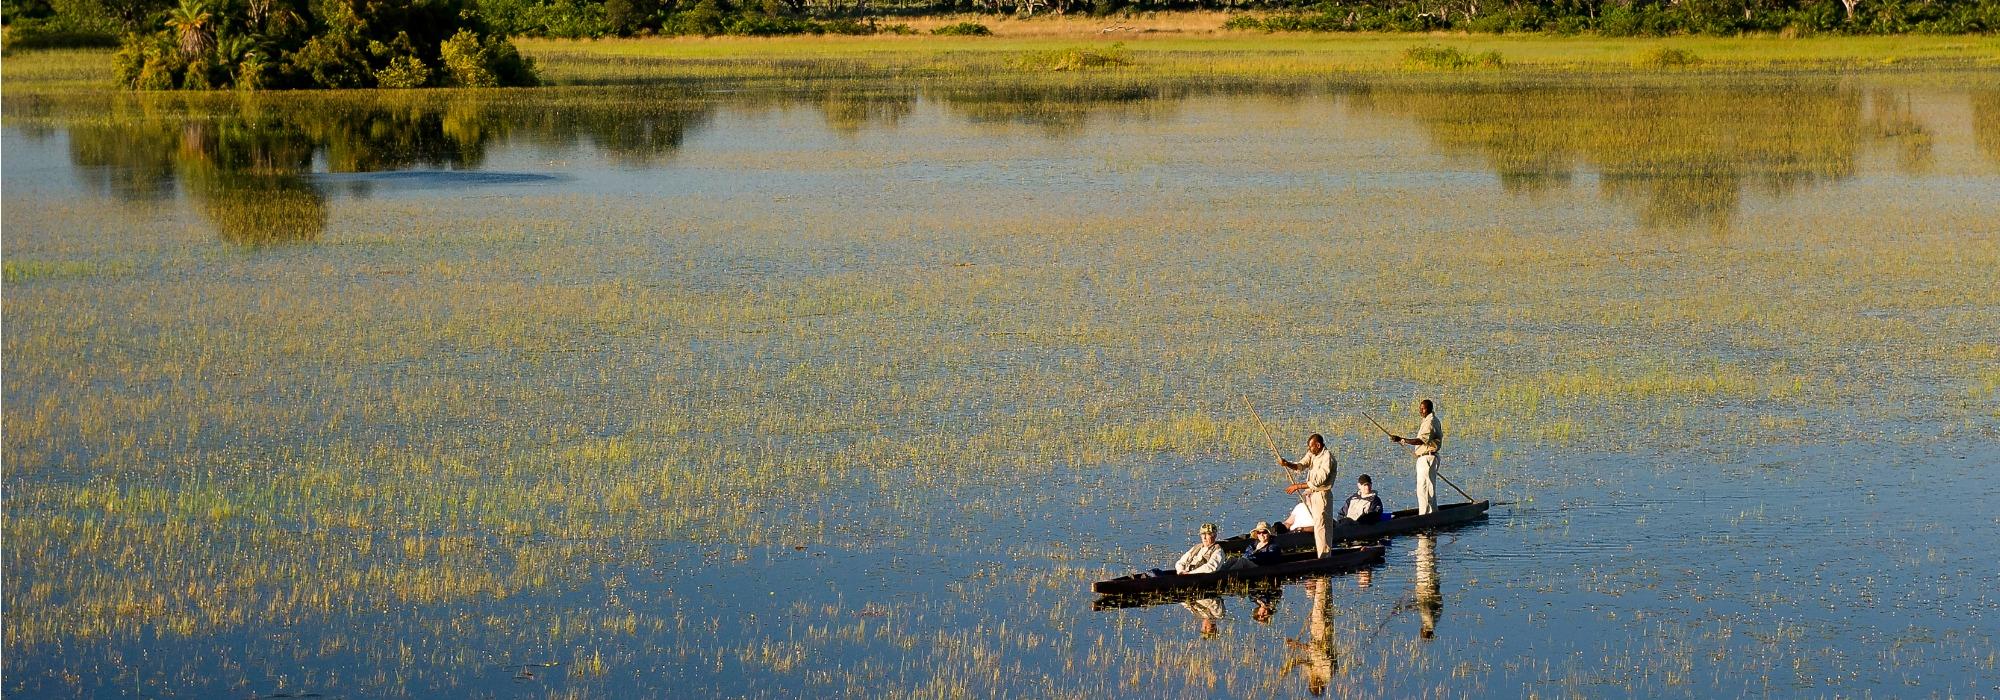 Mokoro Canoe ride